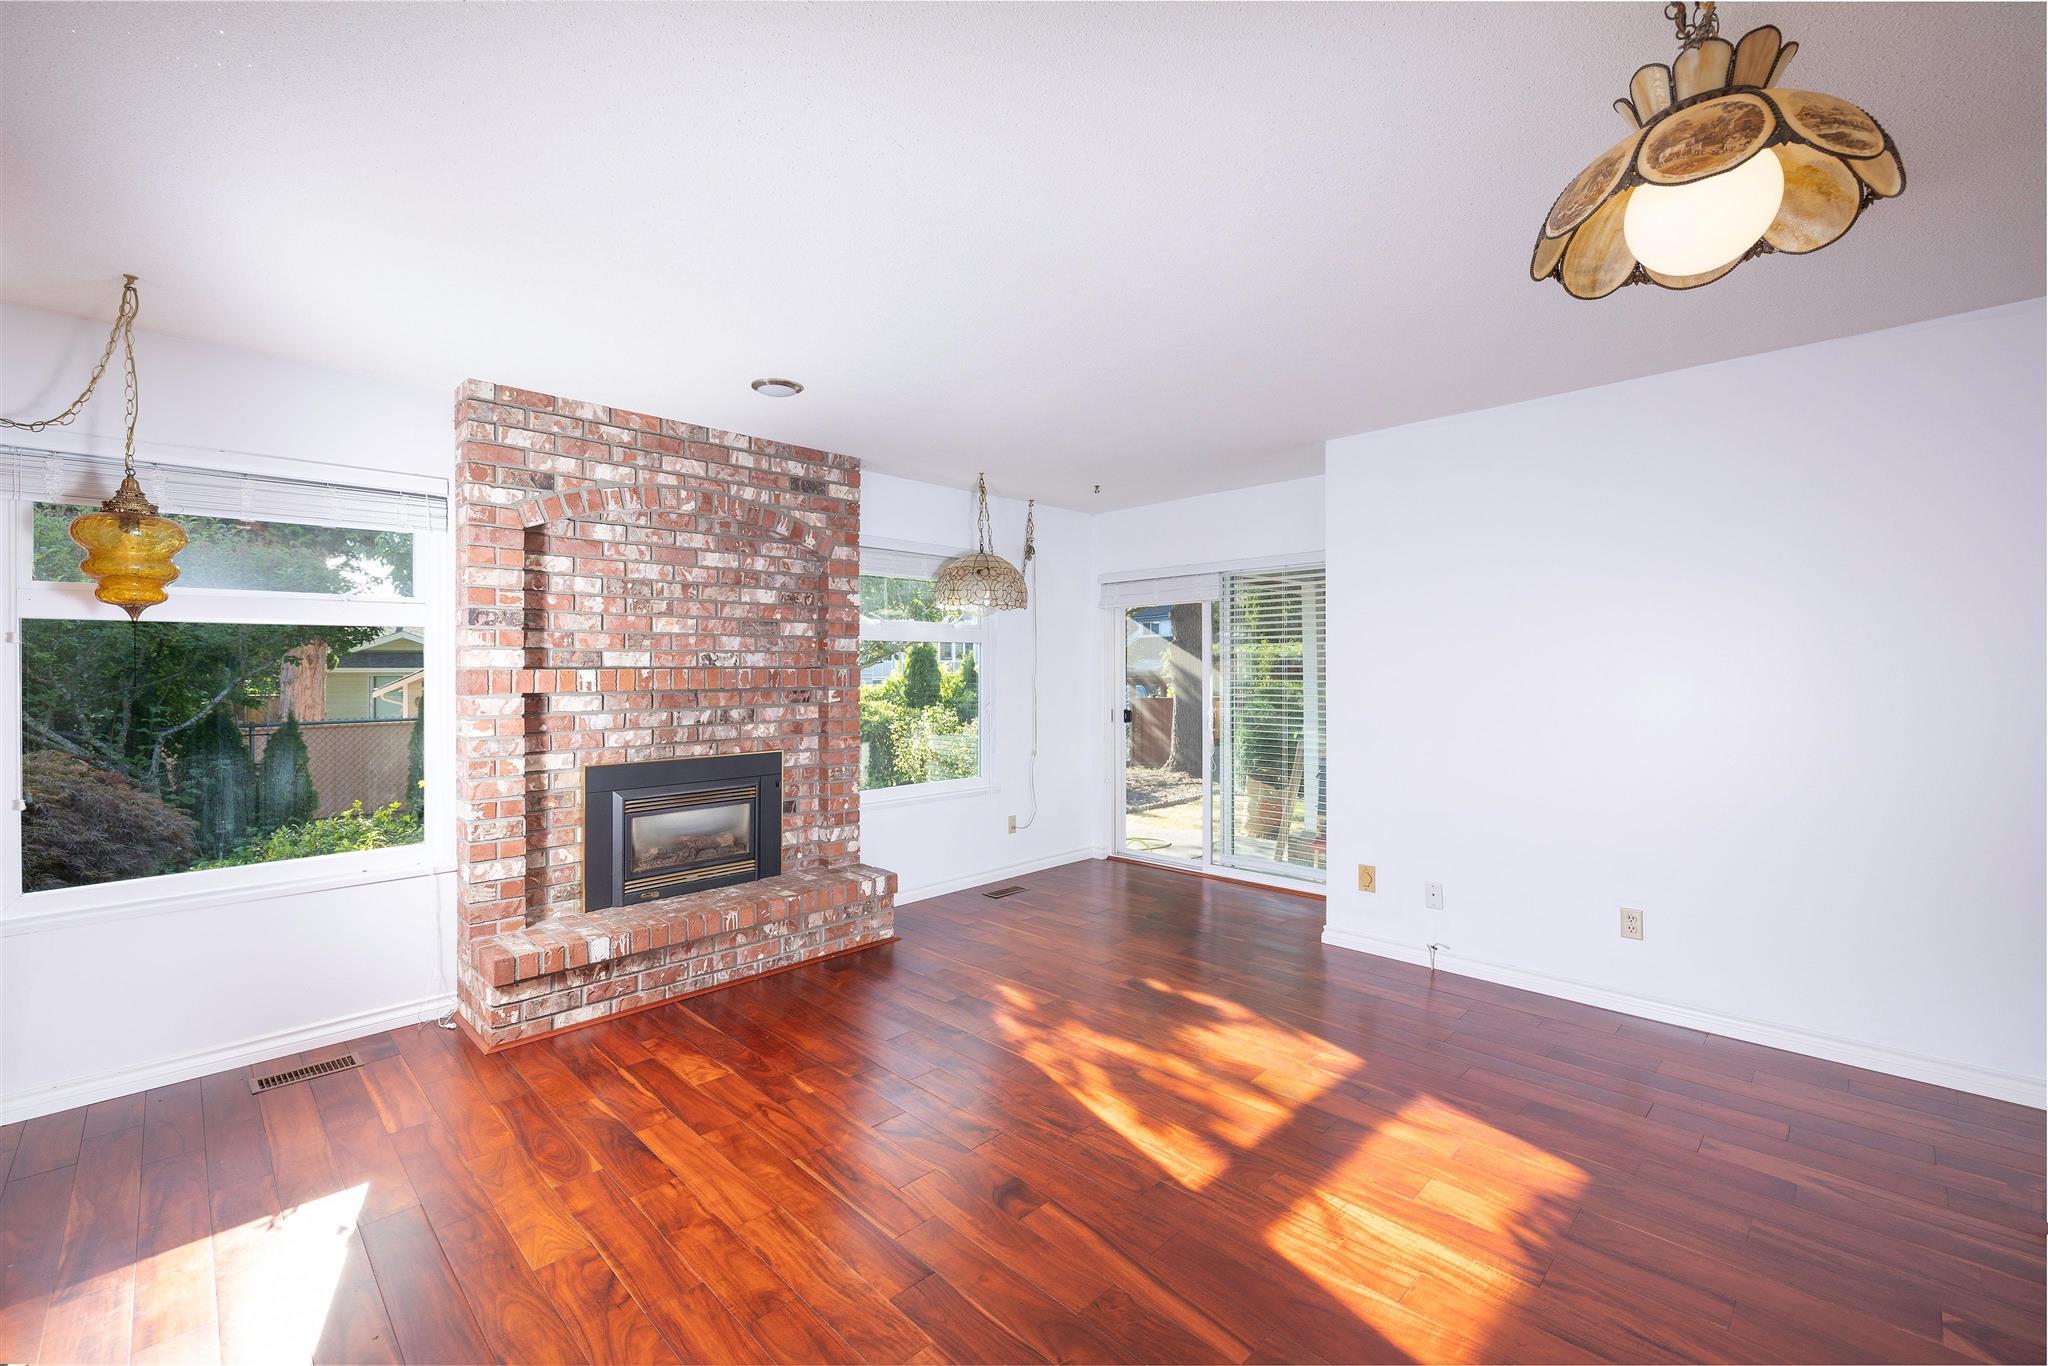 1743 148A STREET - Sunnyside Park Surrey House/Single Family for sale, 3 Bedrooms (R2604804) - #8